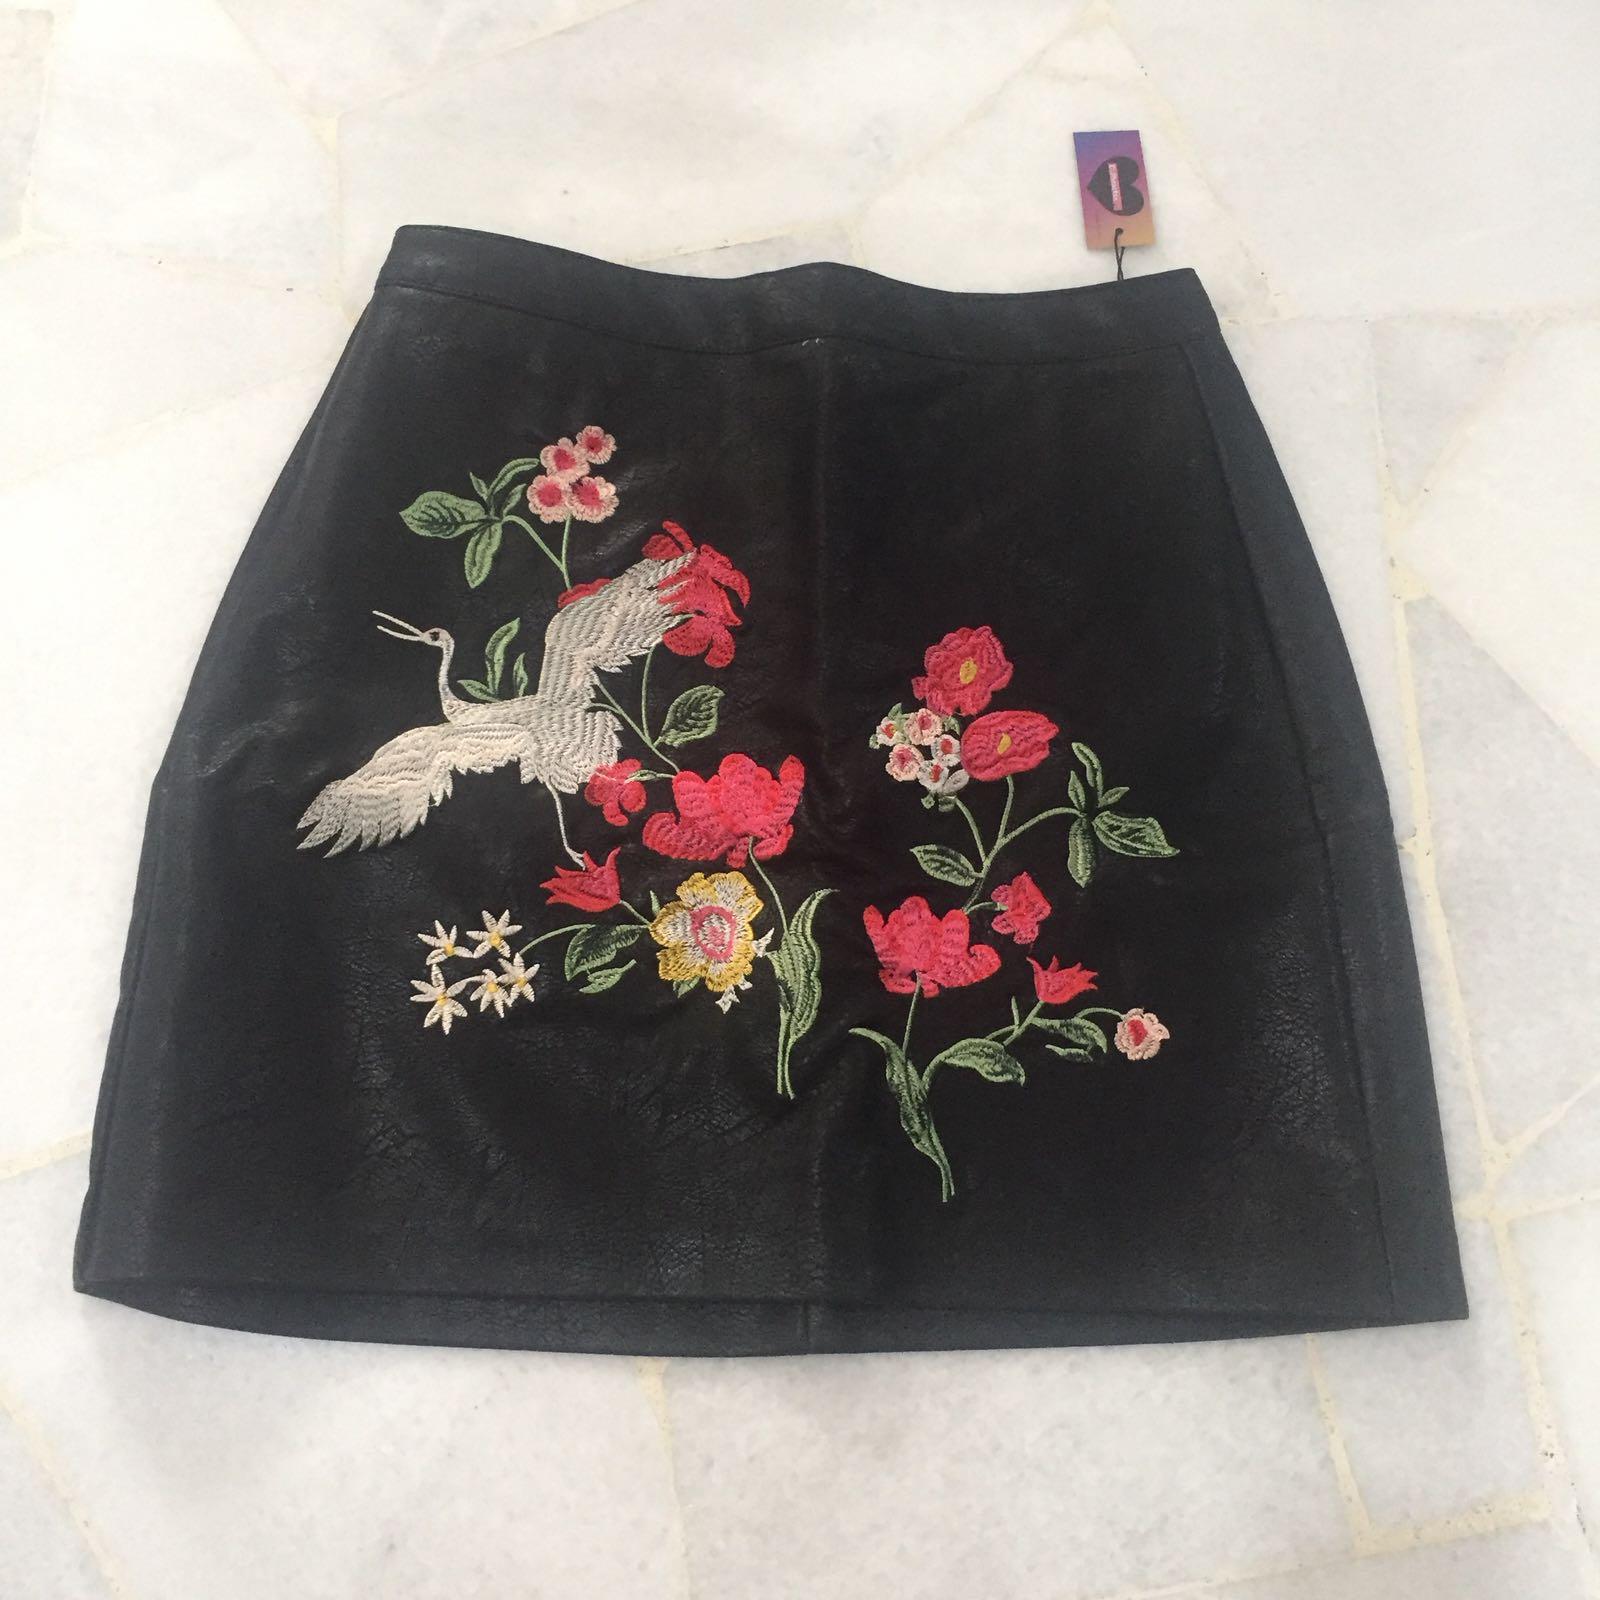 ff0fd8d97 Embroidered Leather Mini Skirt Zara – DACC